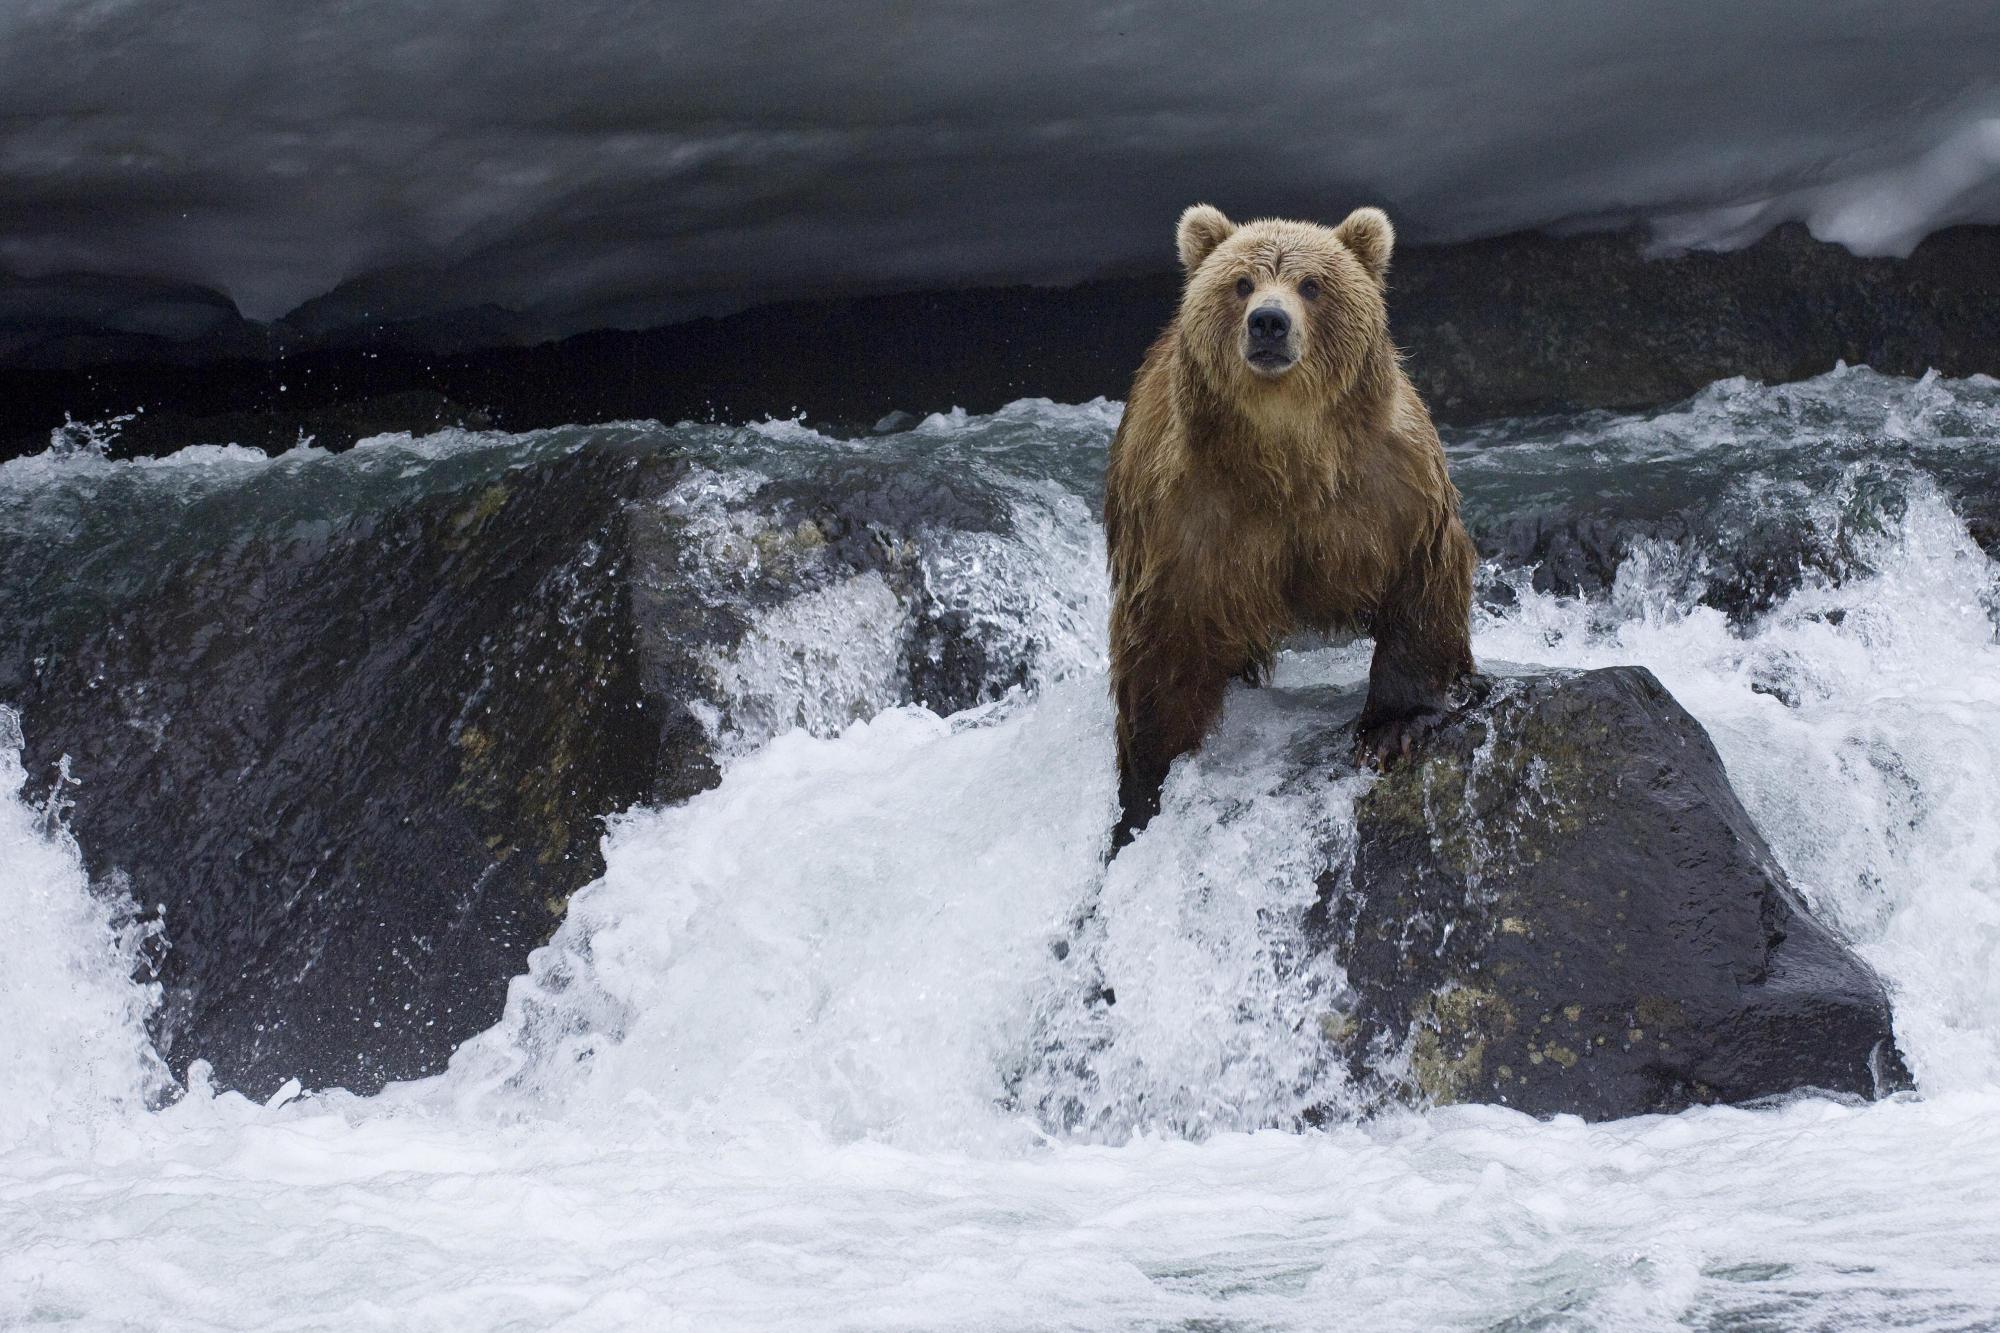 bear-animals-download-images-wallpaper-wp3603062